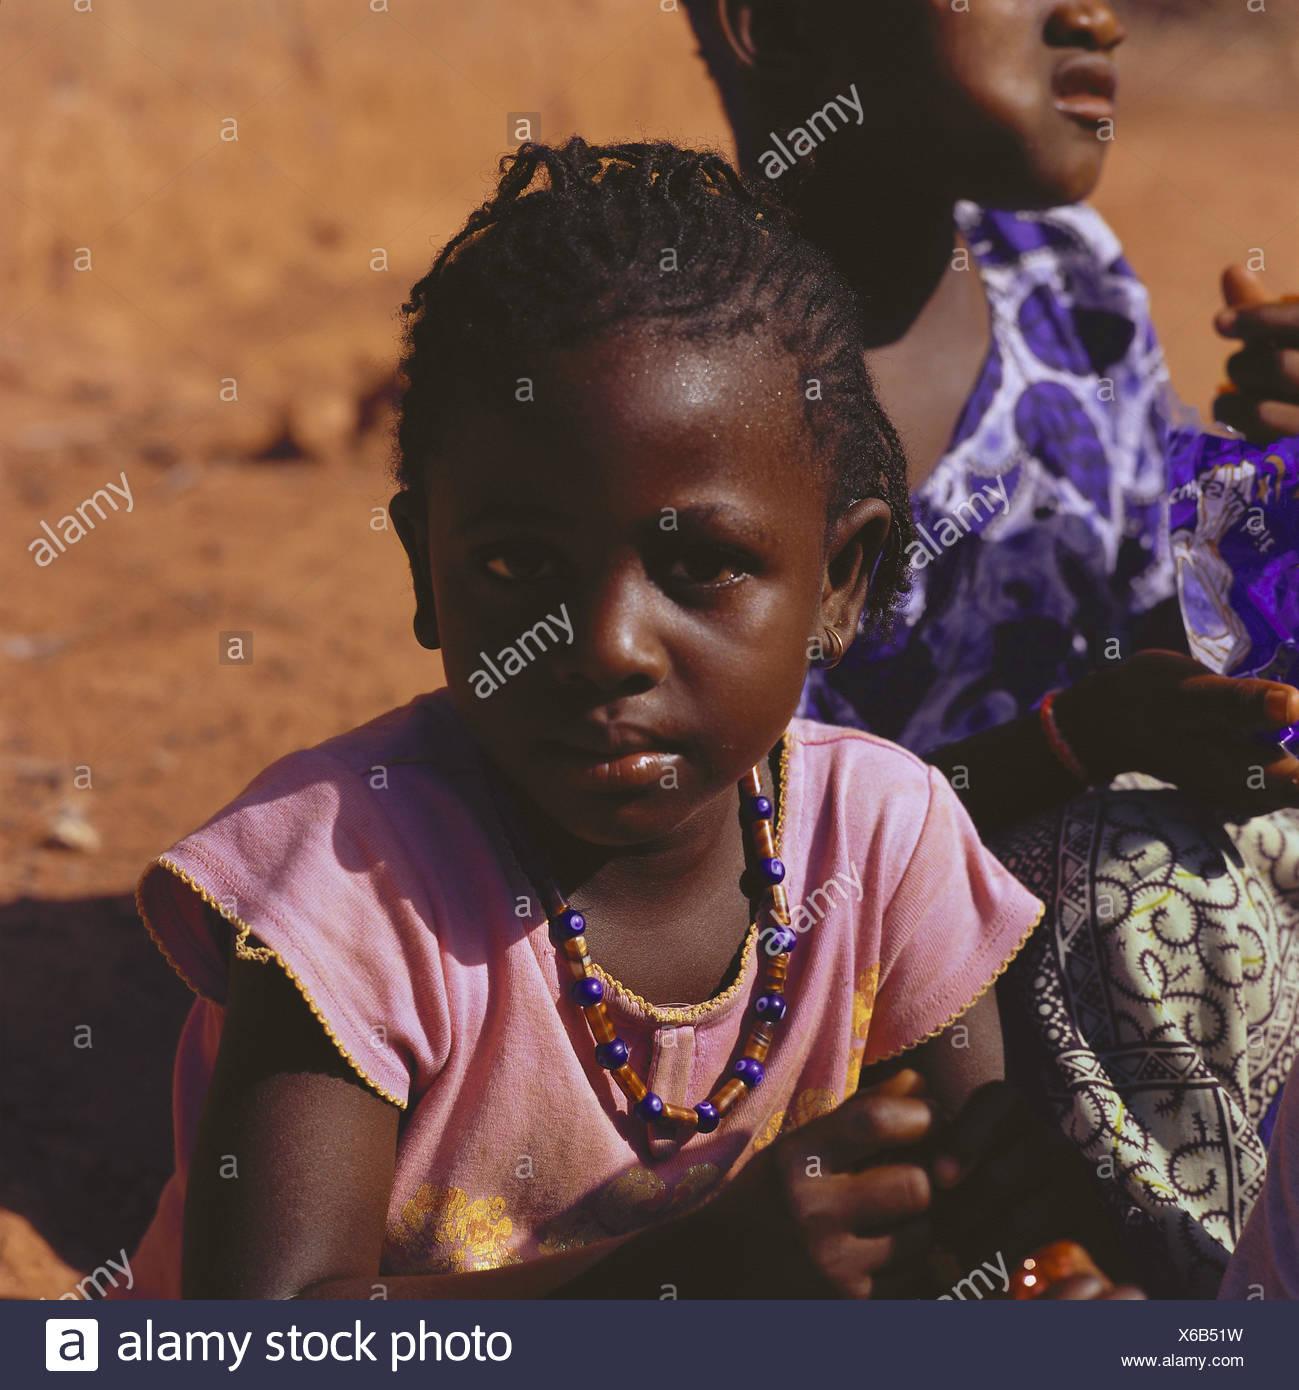 Senegal People Group Stock Photos & Senegal People Group